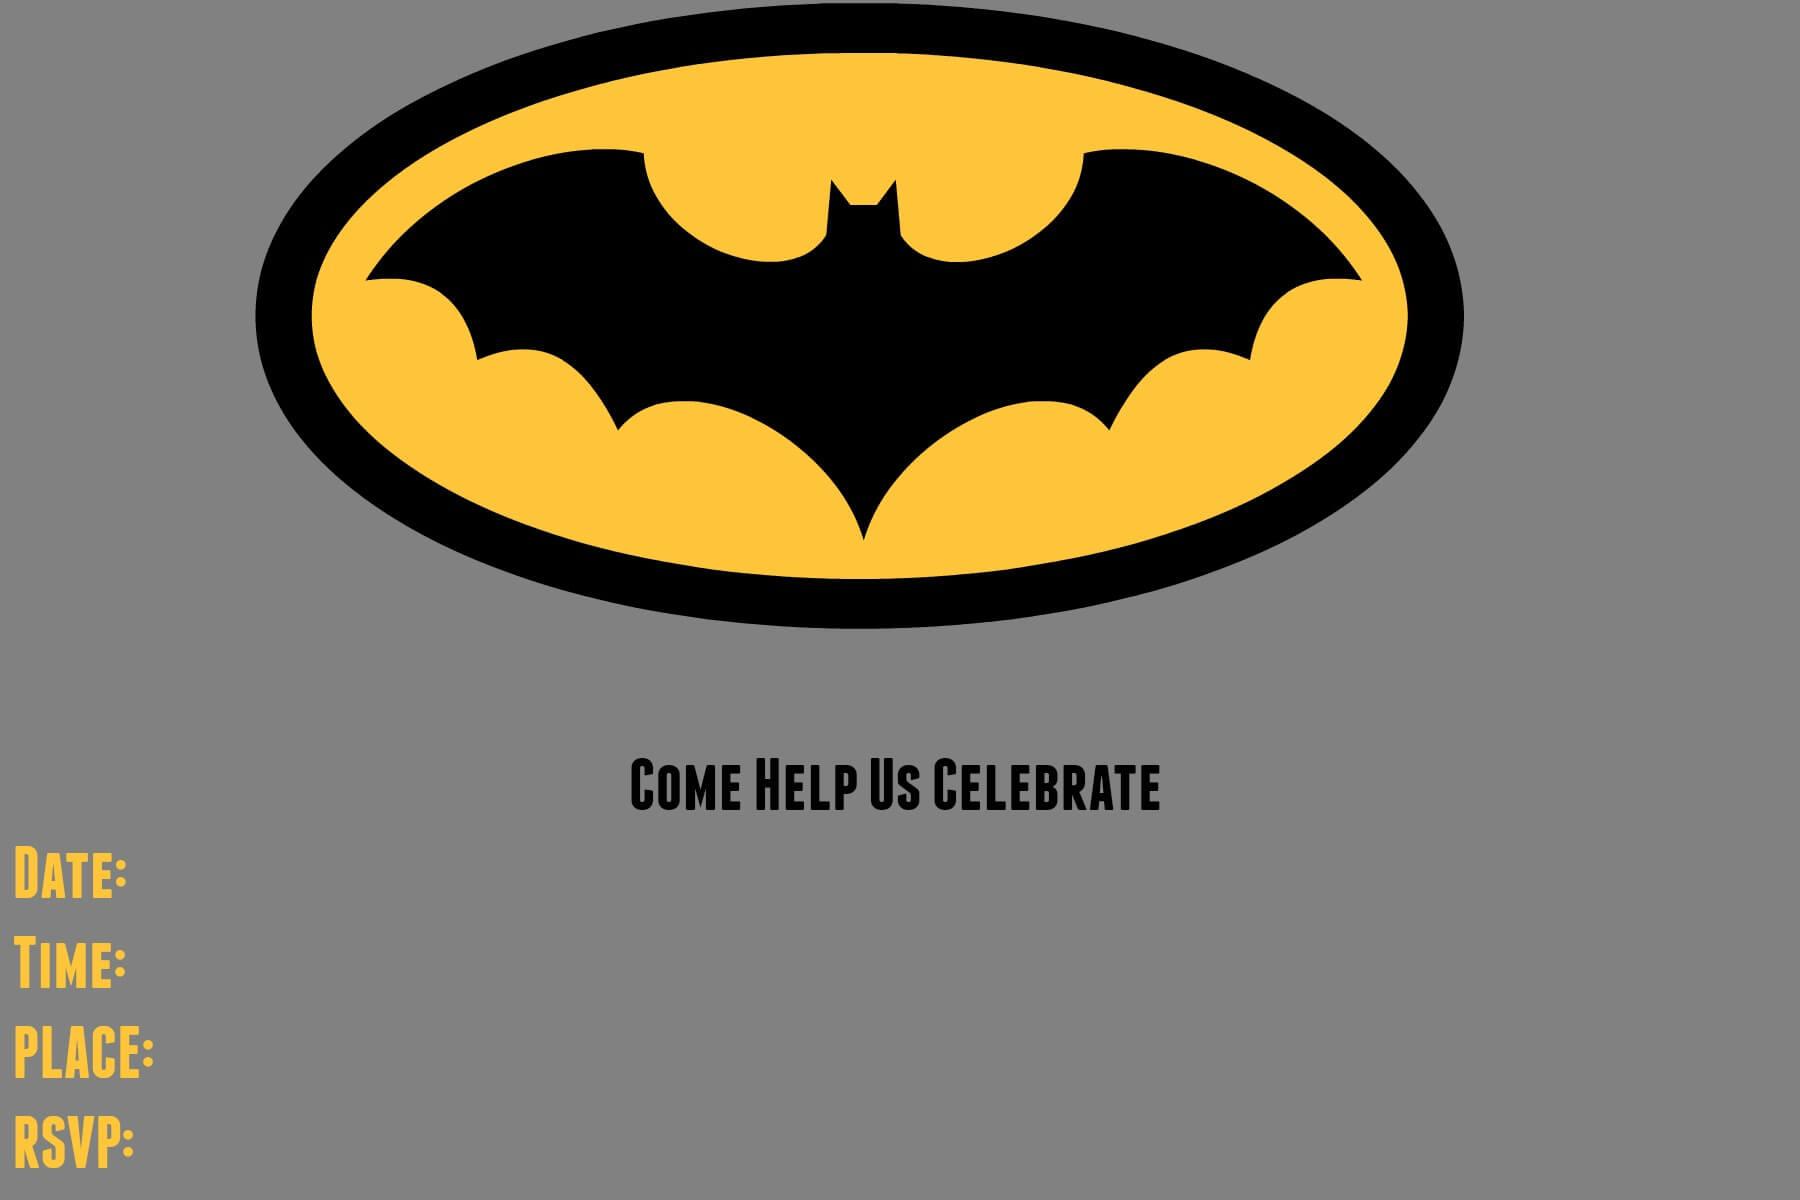 9 Awesome Batman Birthday Invitations | Kittybabylove Within Batman Birthday Card Template